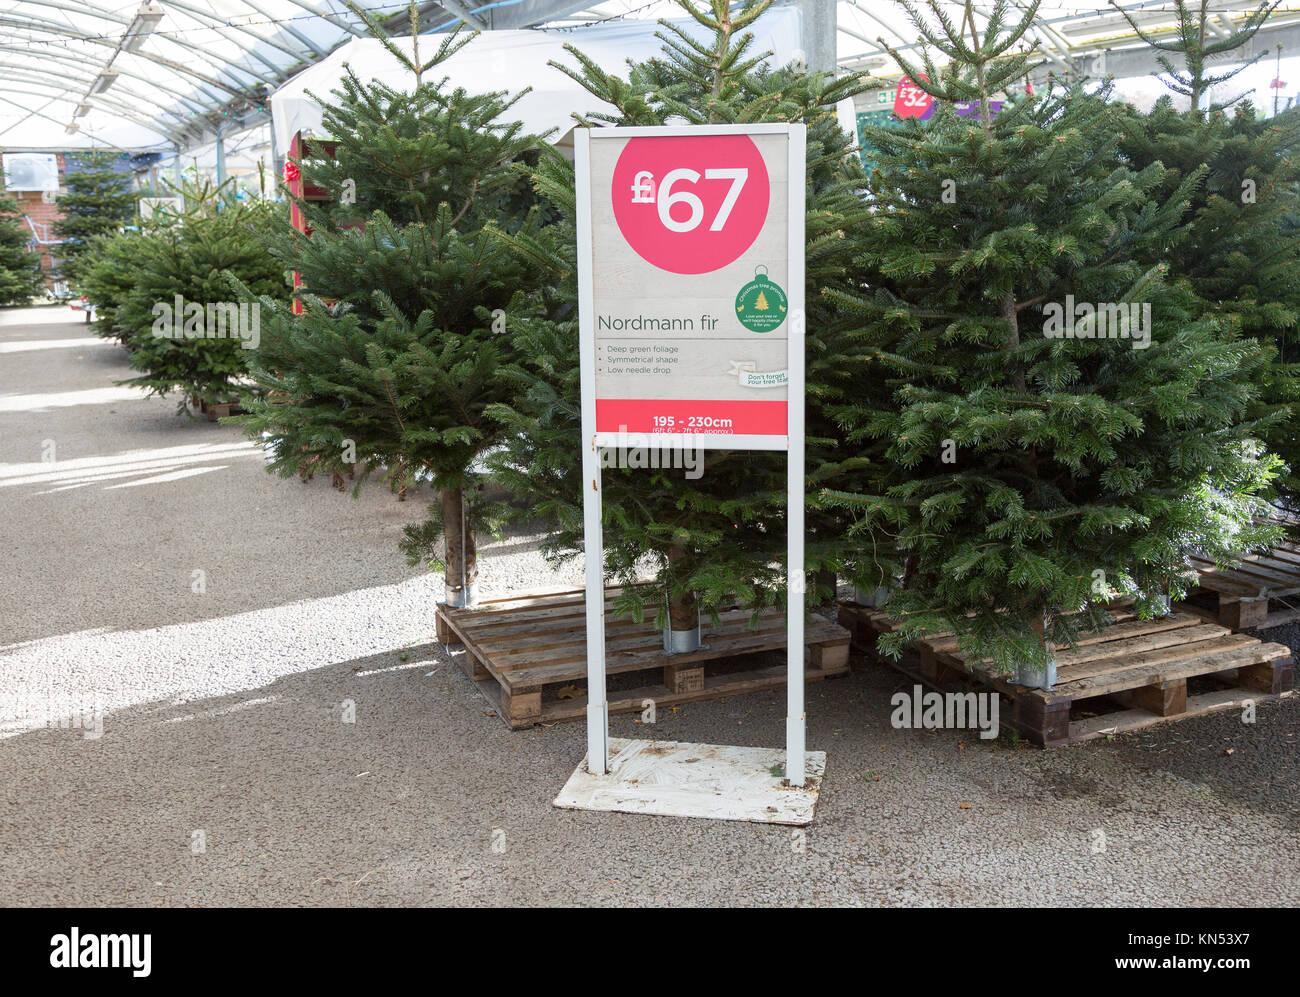 Nordmann fir Christmas trees on sale for £67 in garden centre, Suffolk, England, UK - Stock Image